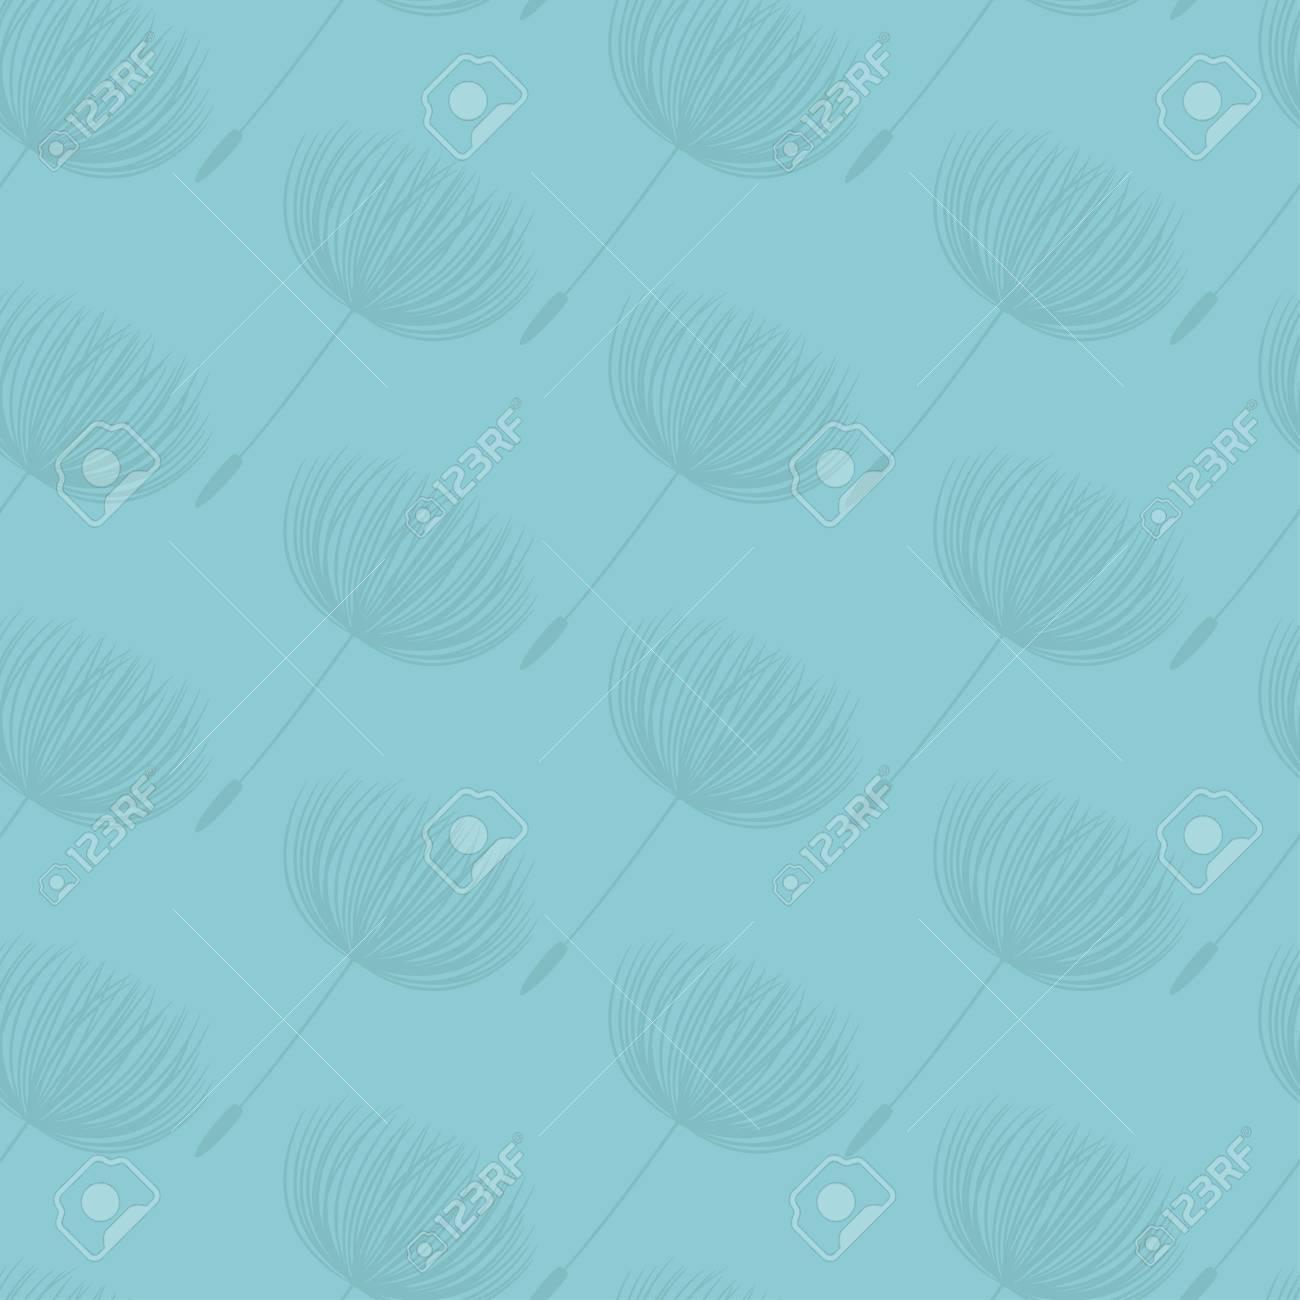 Abstract fluffy dandelion flower seamless pattern. Vector illustration - 62373417